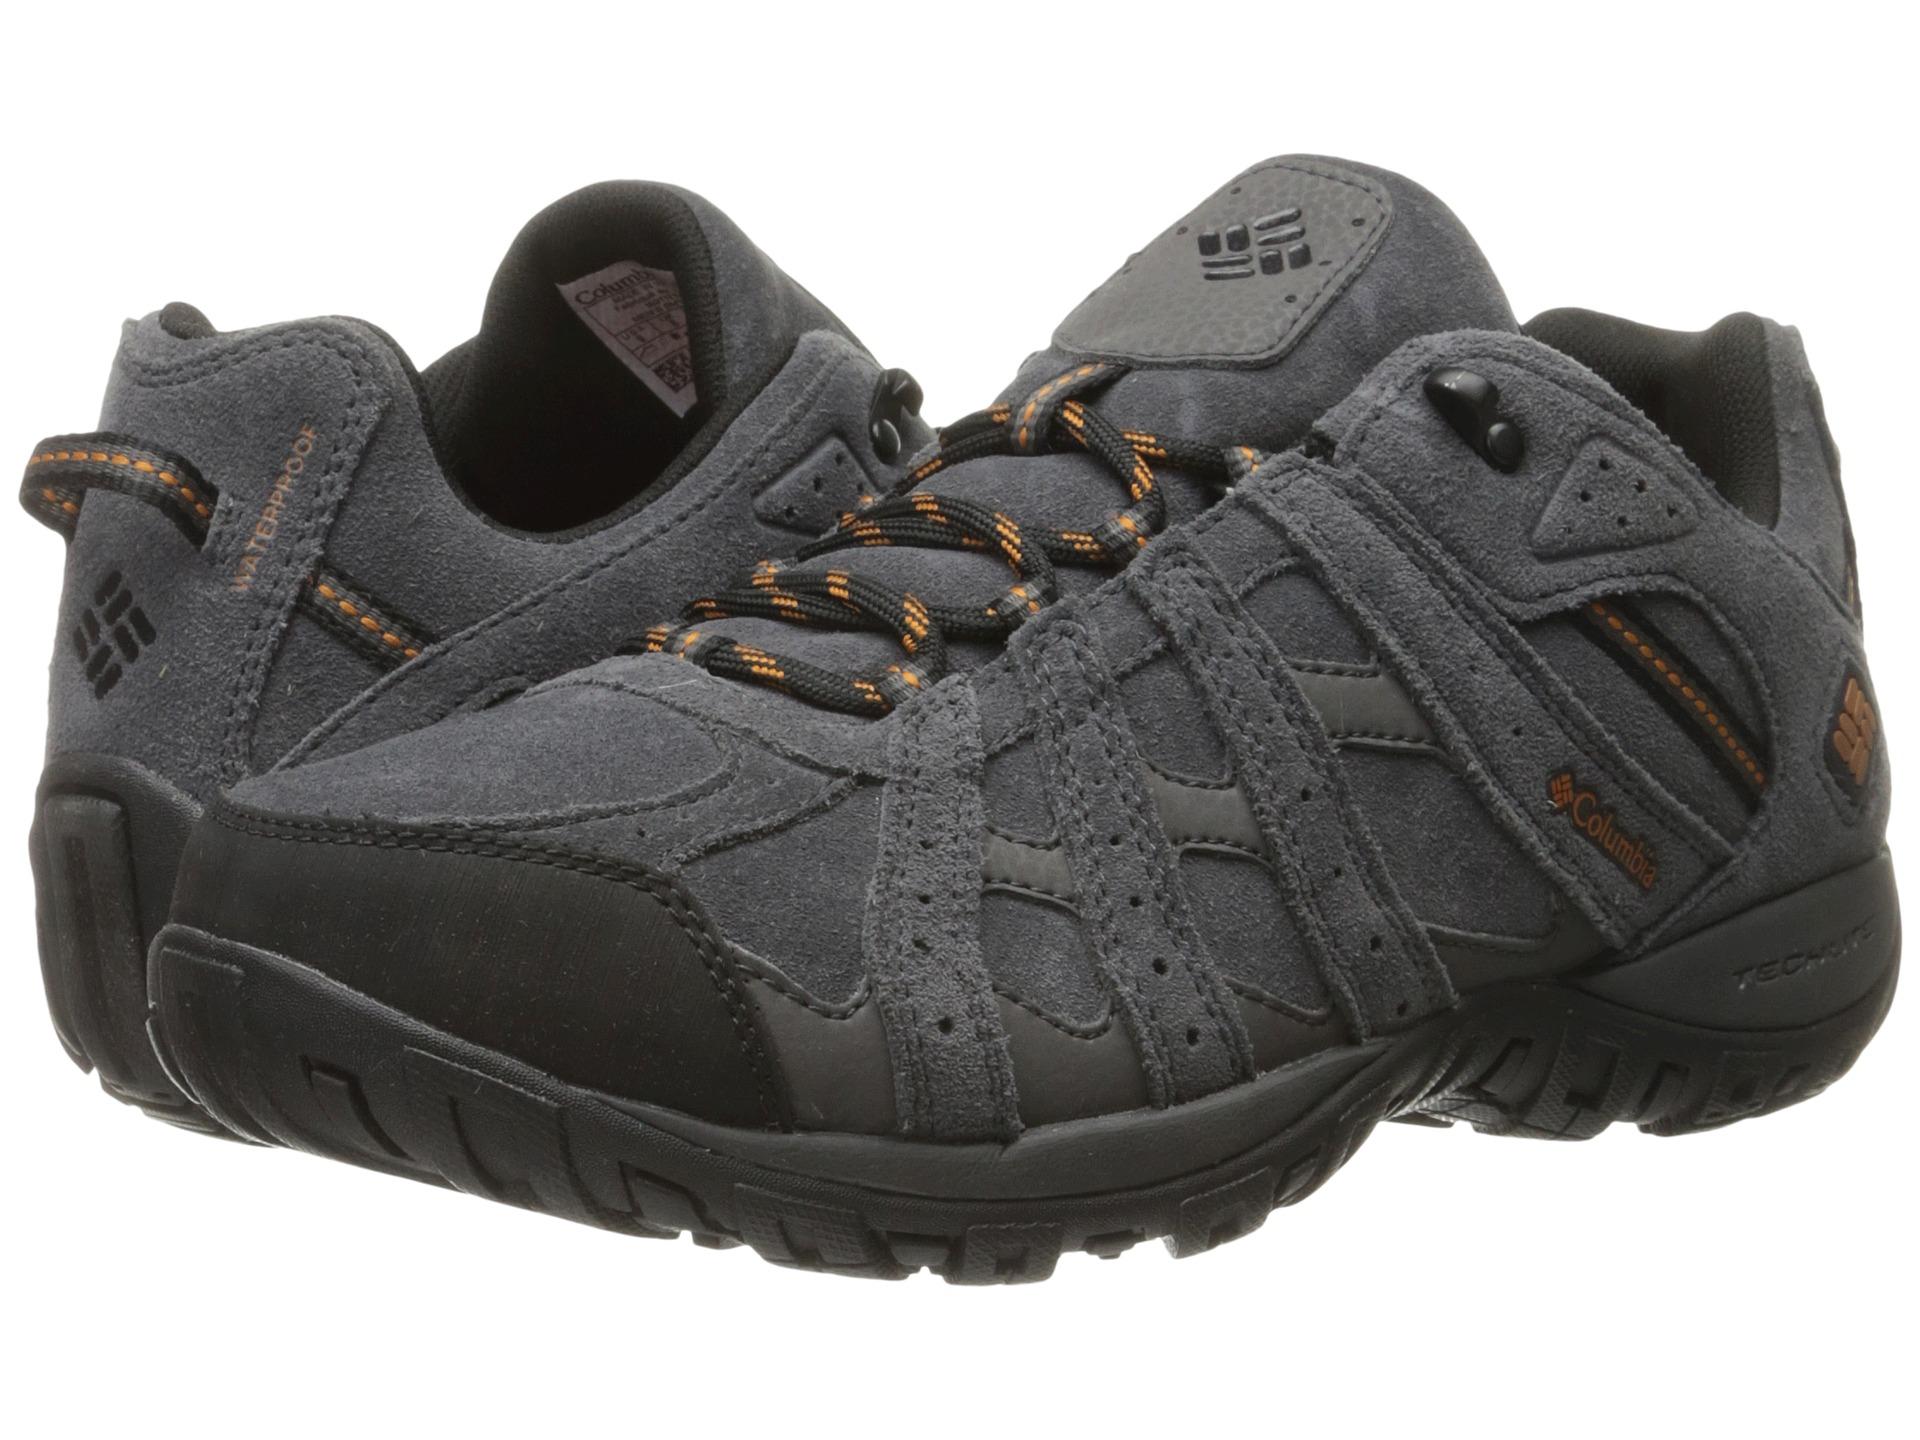 Columbia Men S Redmond Leather Omni Tech Waterproof Hiking Shoes